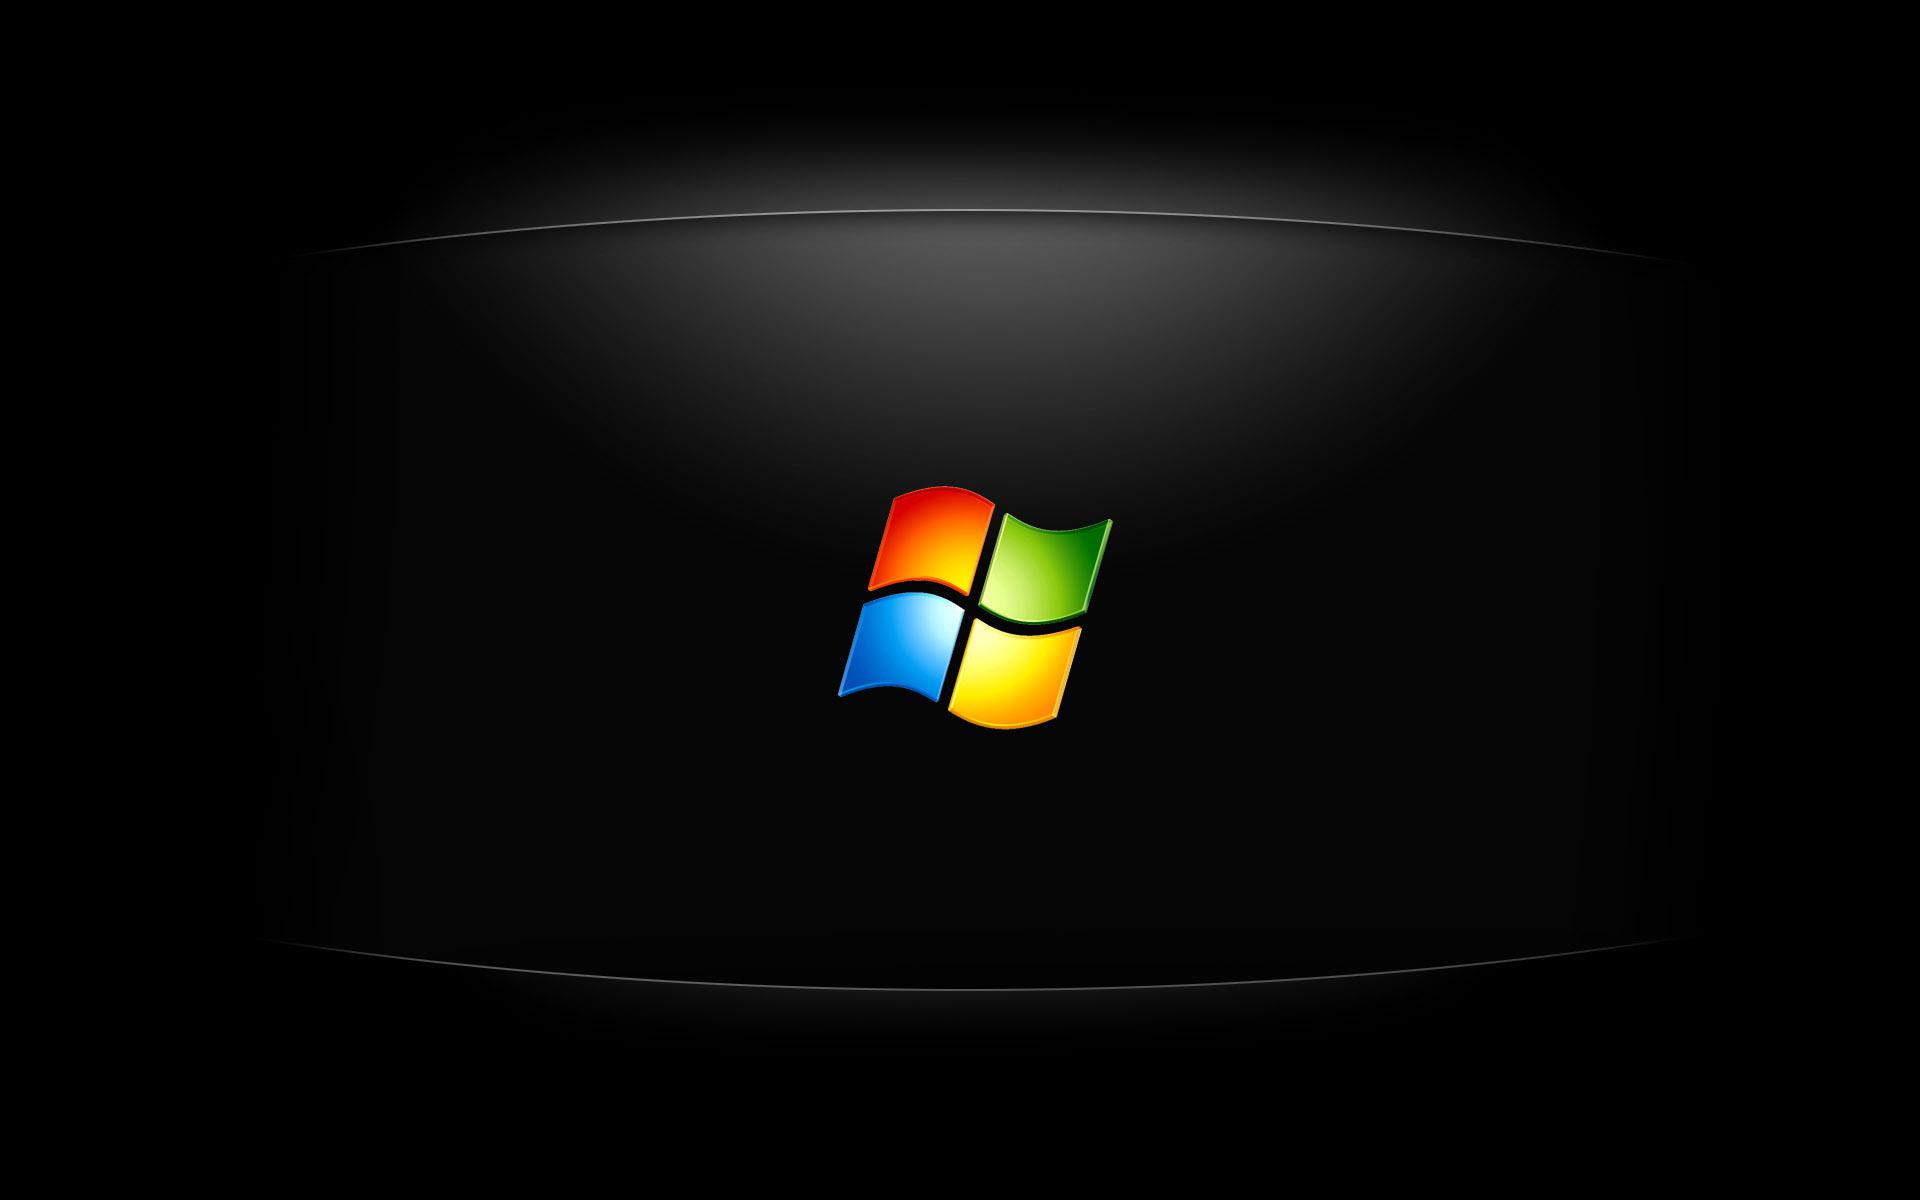 cool laptop backgrounds - wallpapersafari